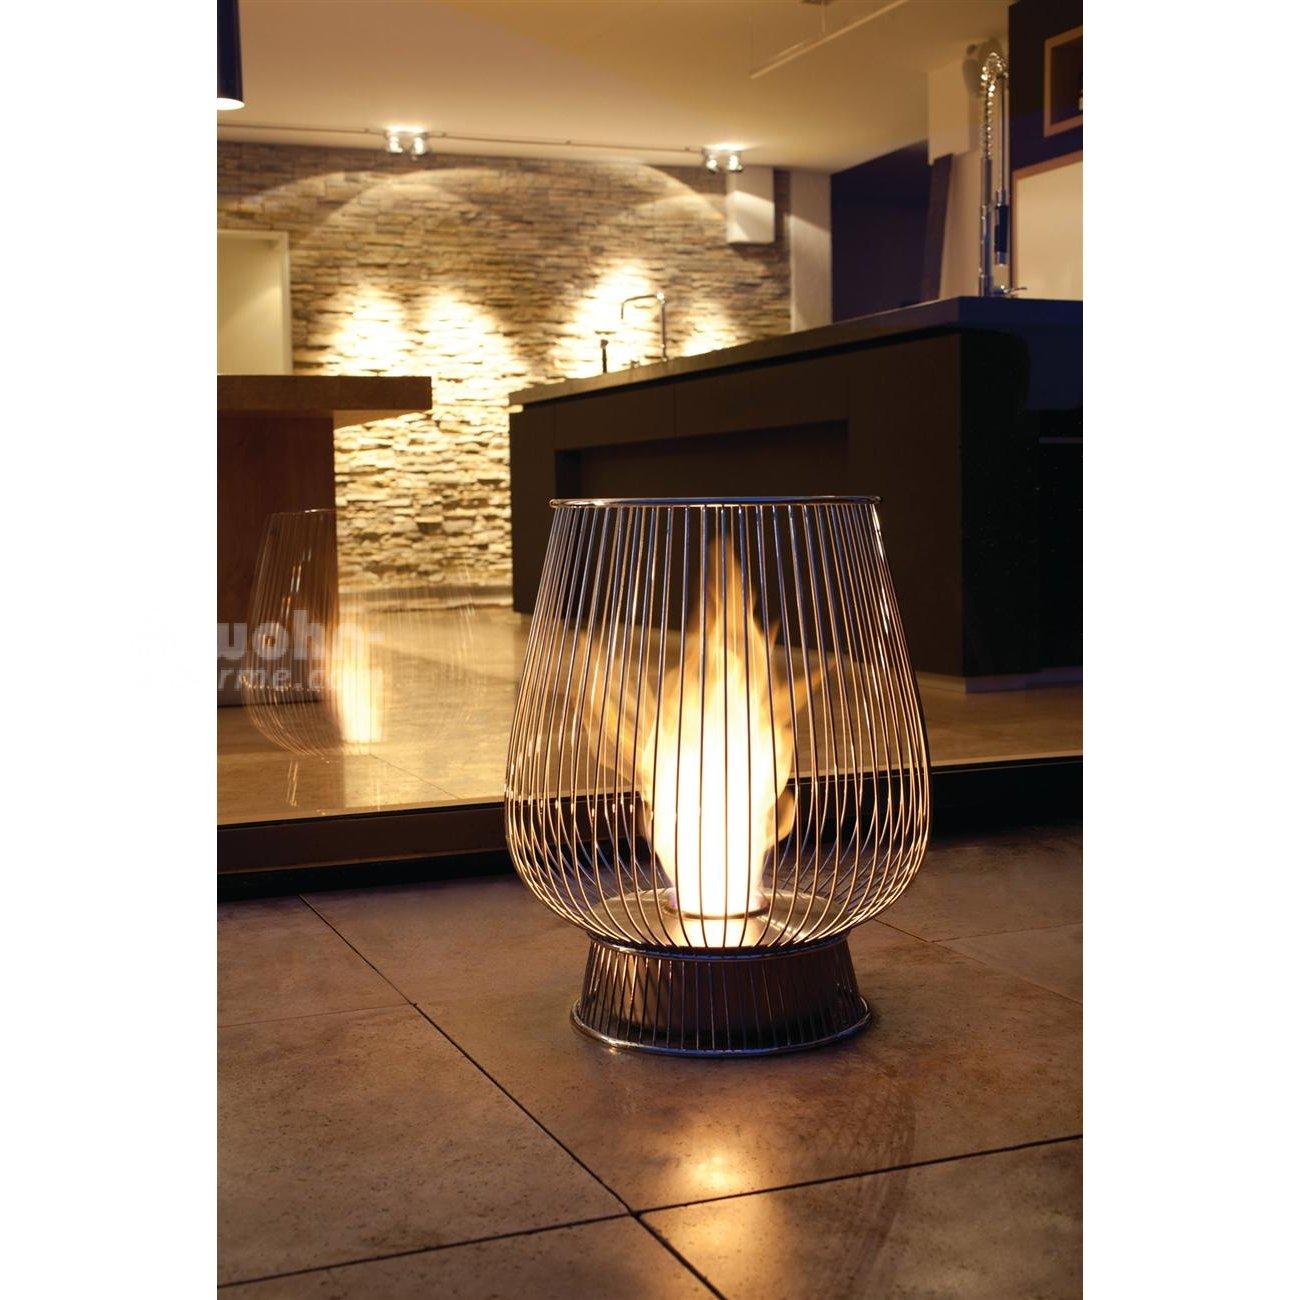 ecosmart garten ethanol feuer bulb. Black Bedroom Furniture Sets. Home Design Ideas